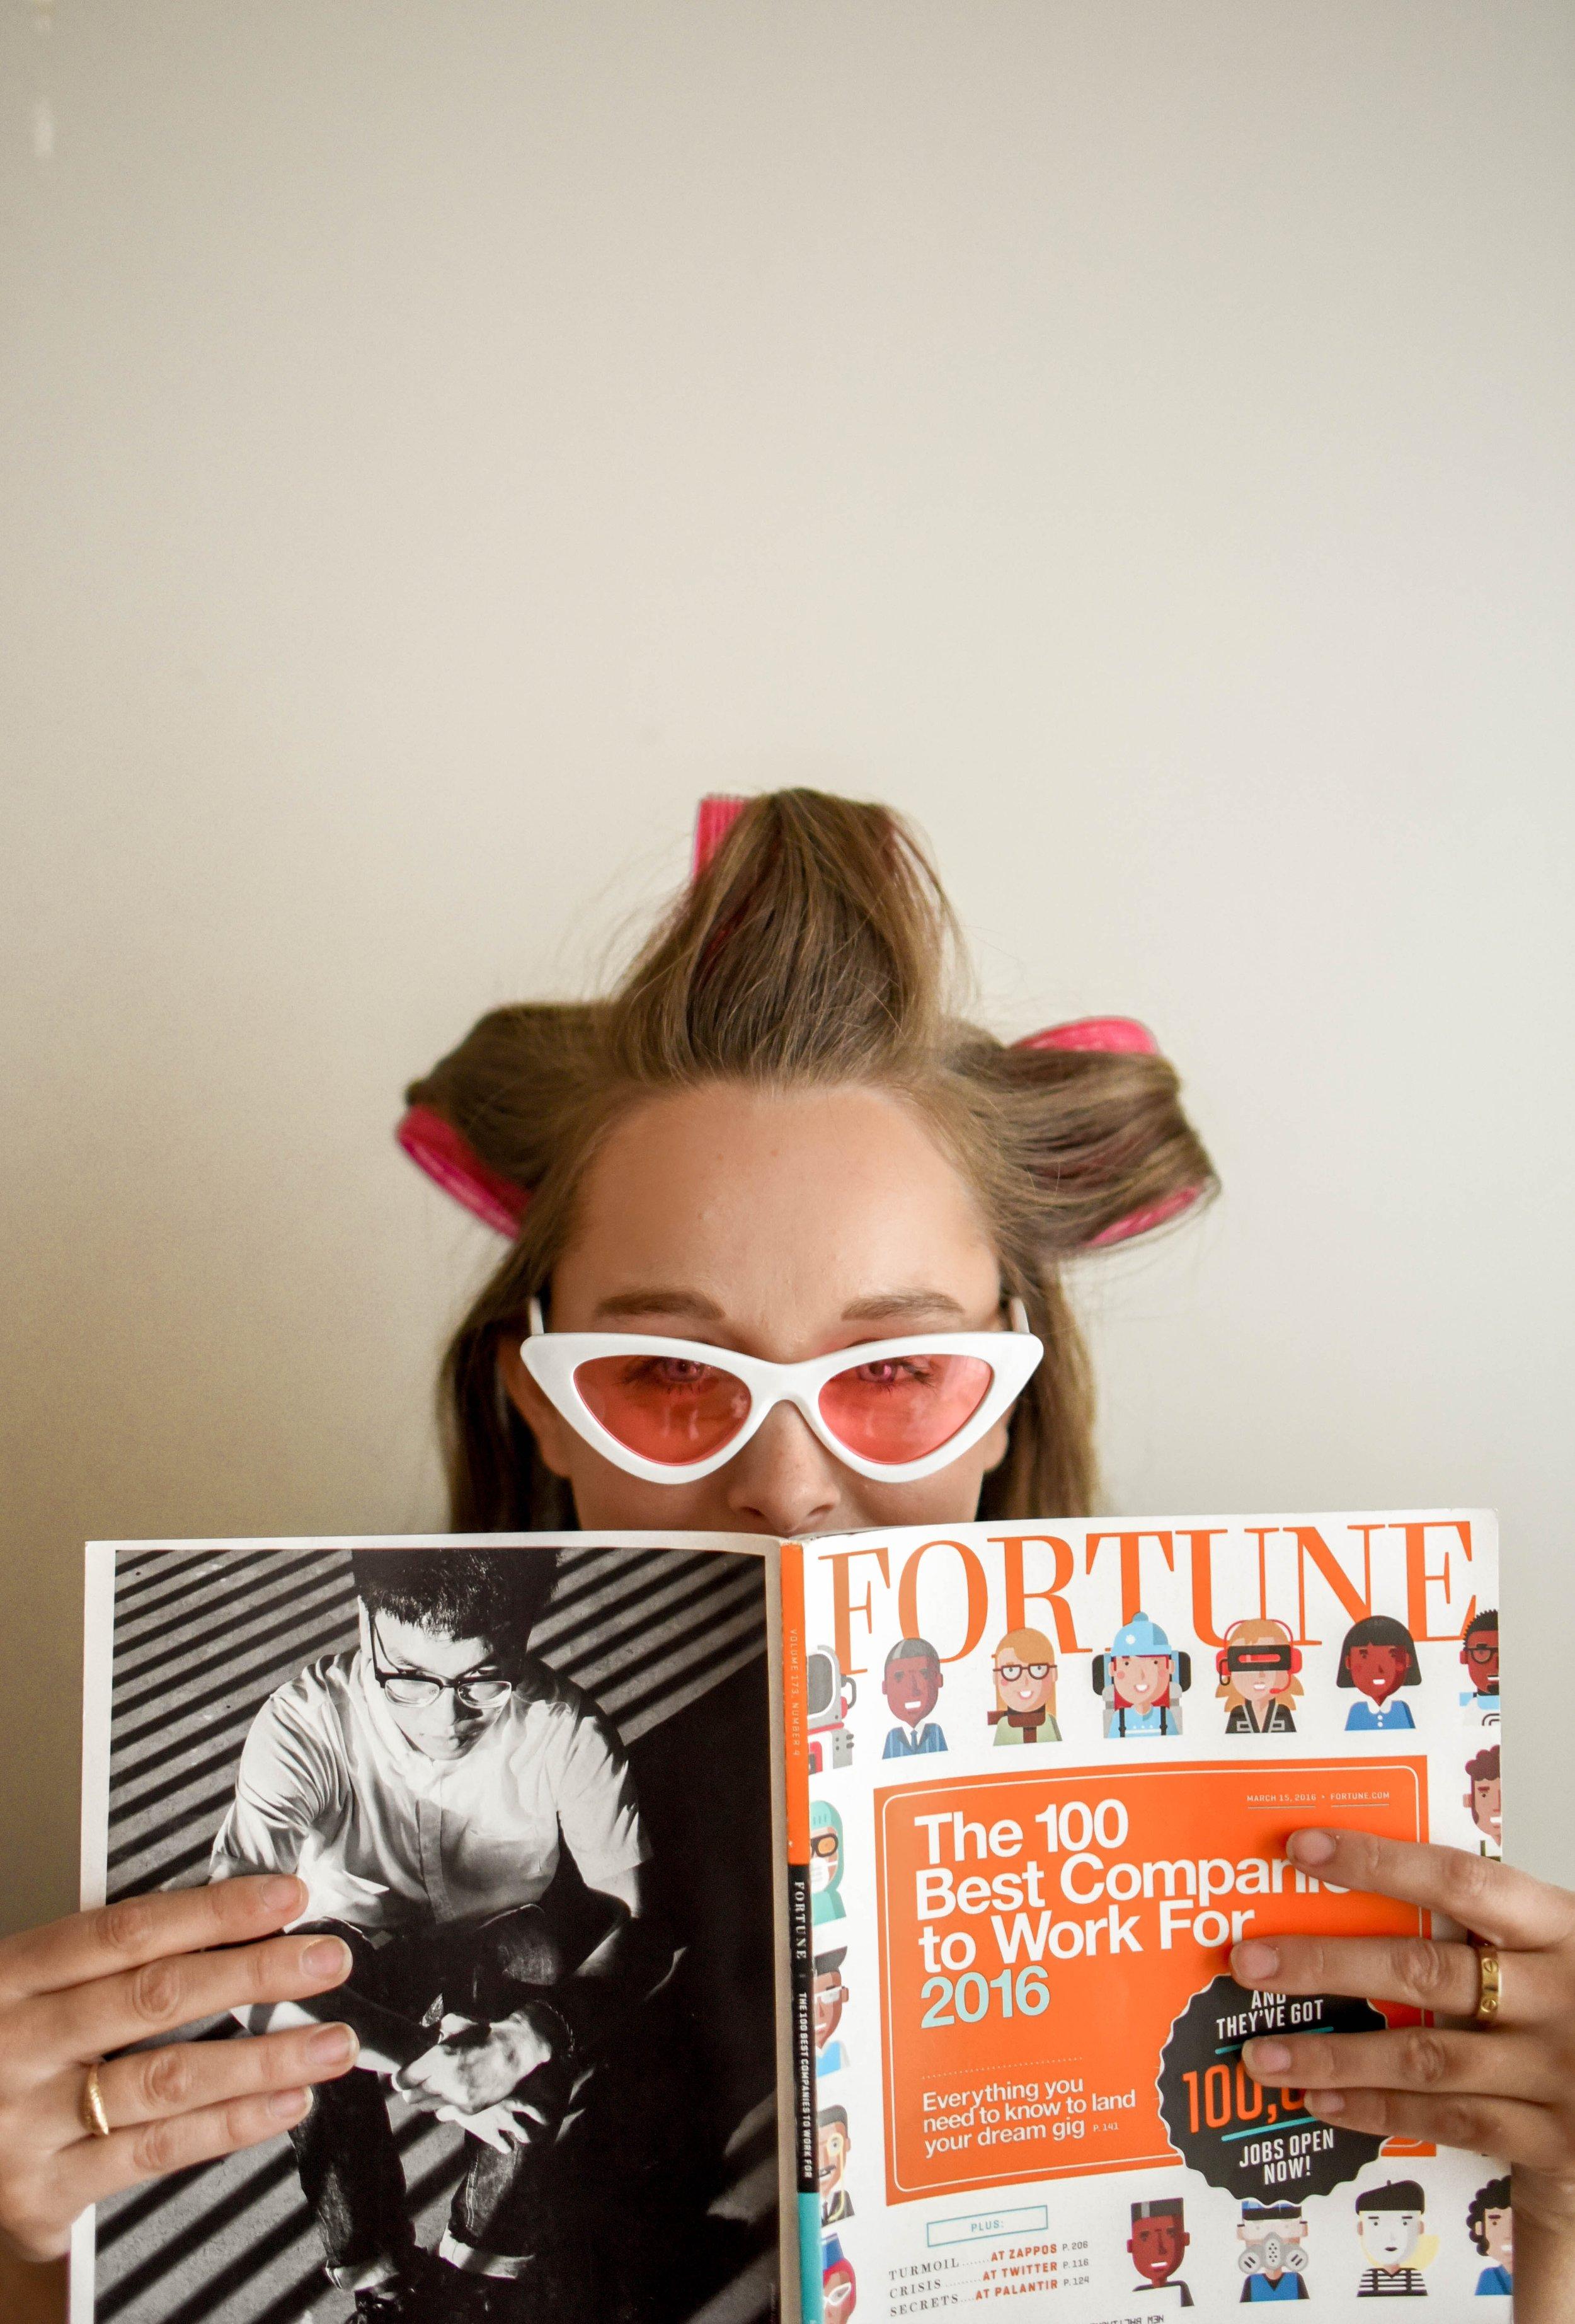 #dermotheque #piel #pelo #alopecia #alopeciafibrosantefrontal #tratamiento #dermatologia #cabello #tricologia.jpg